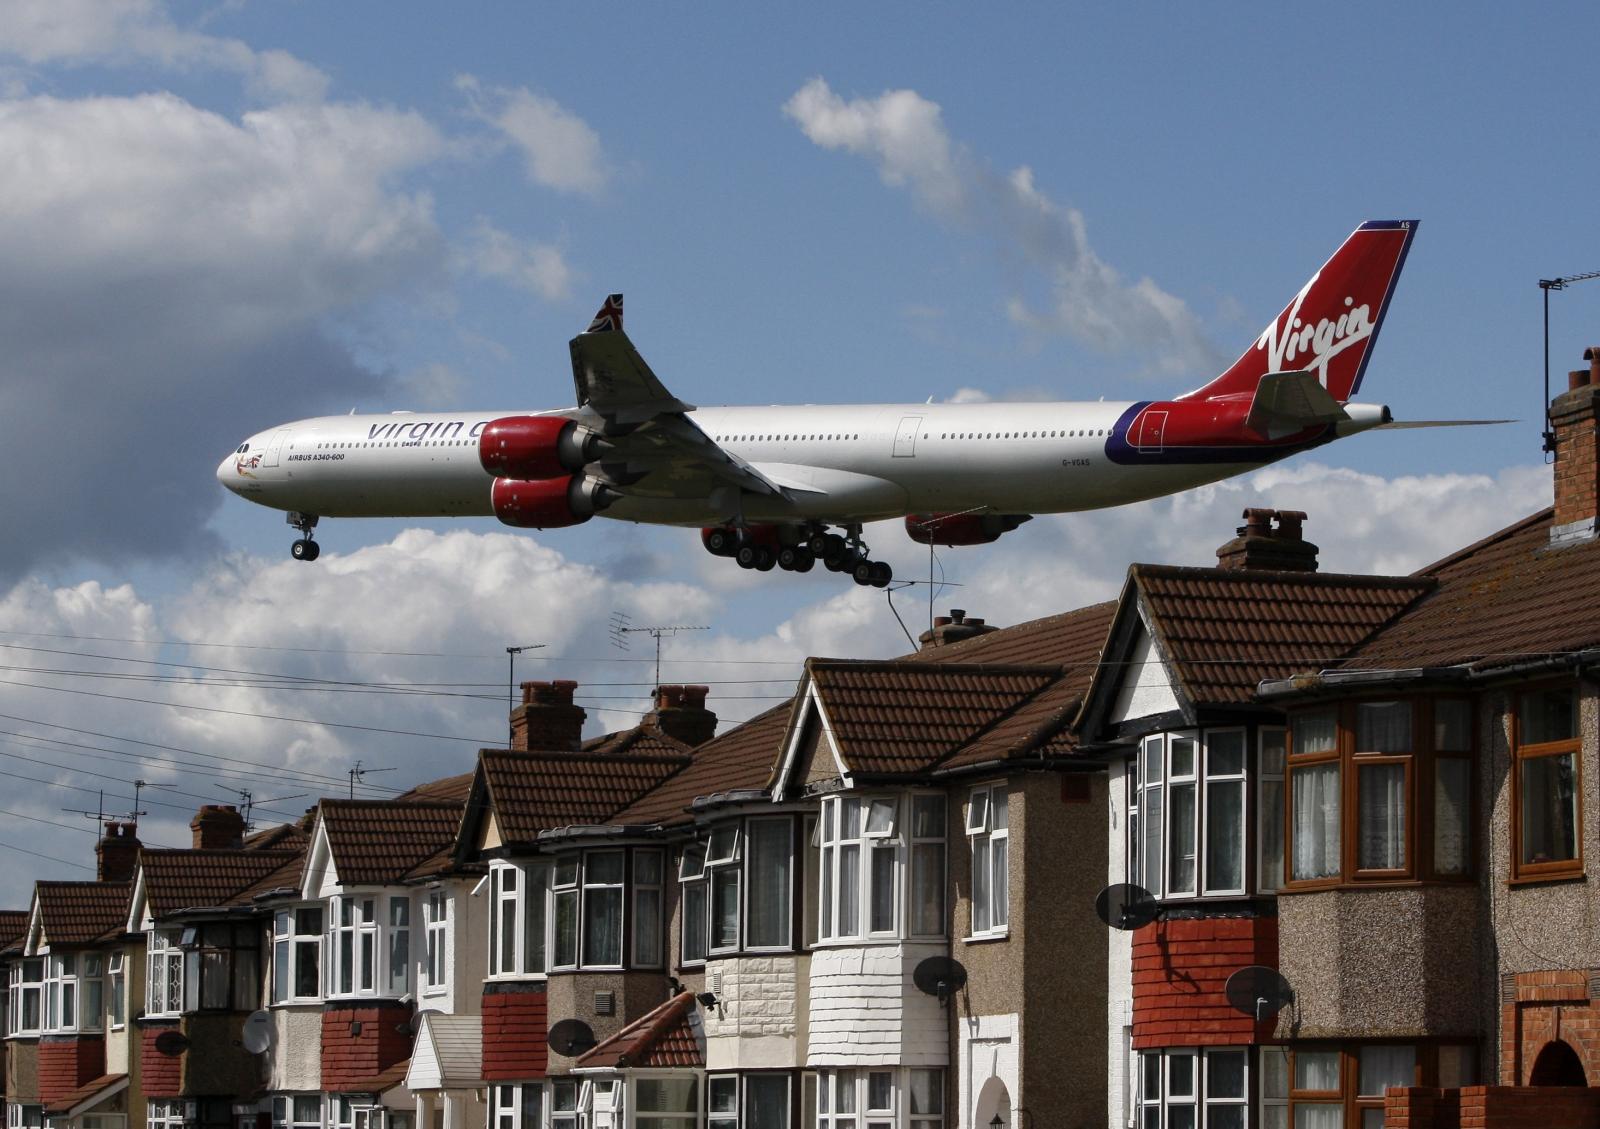 Plane landing Heathrow airport